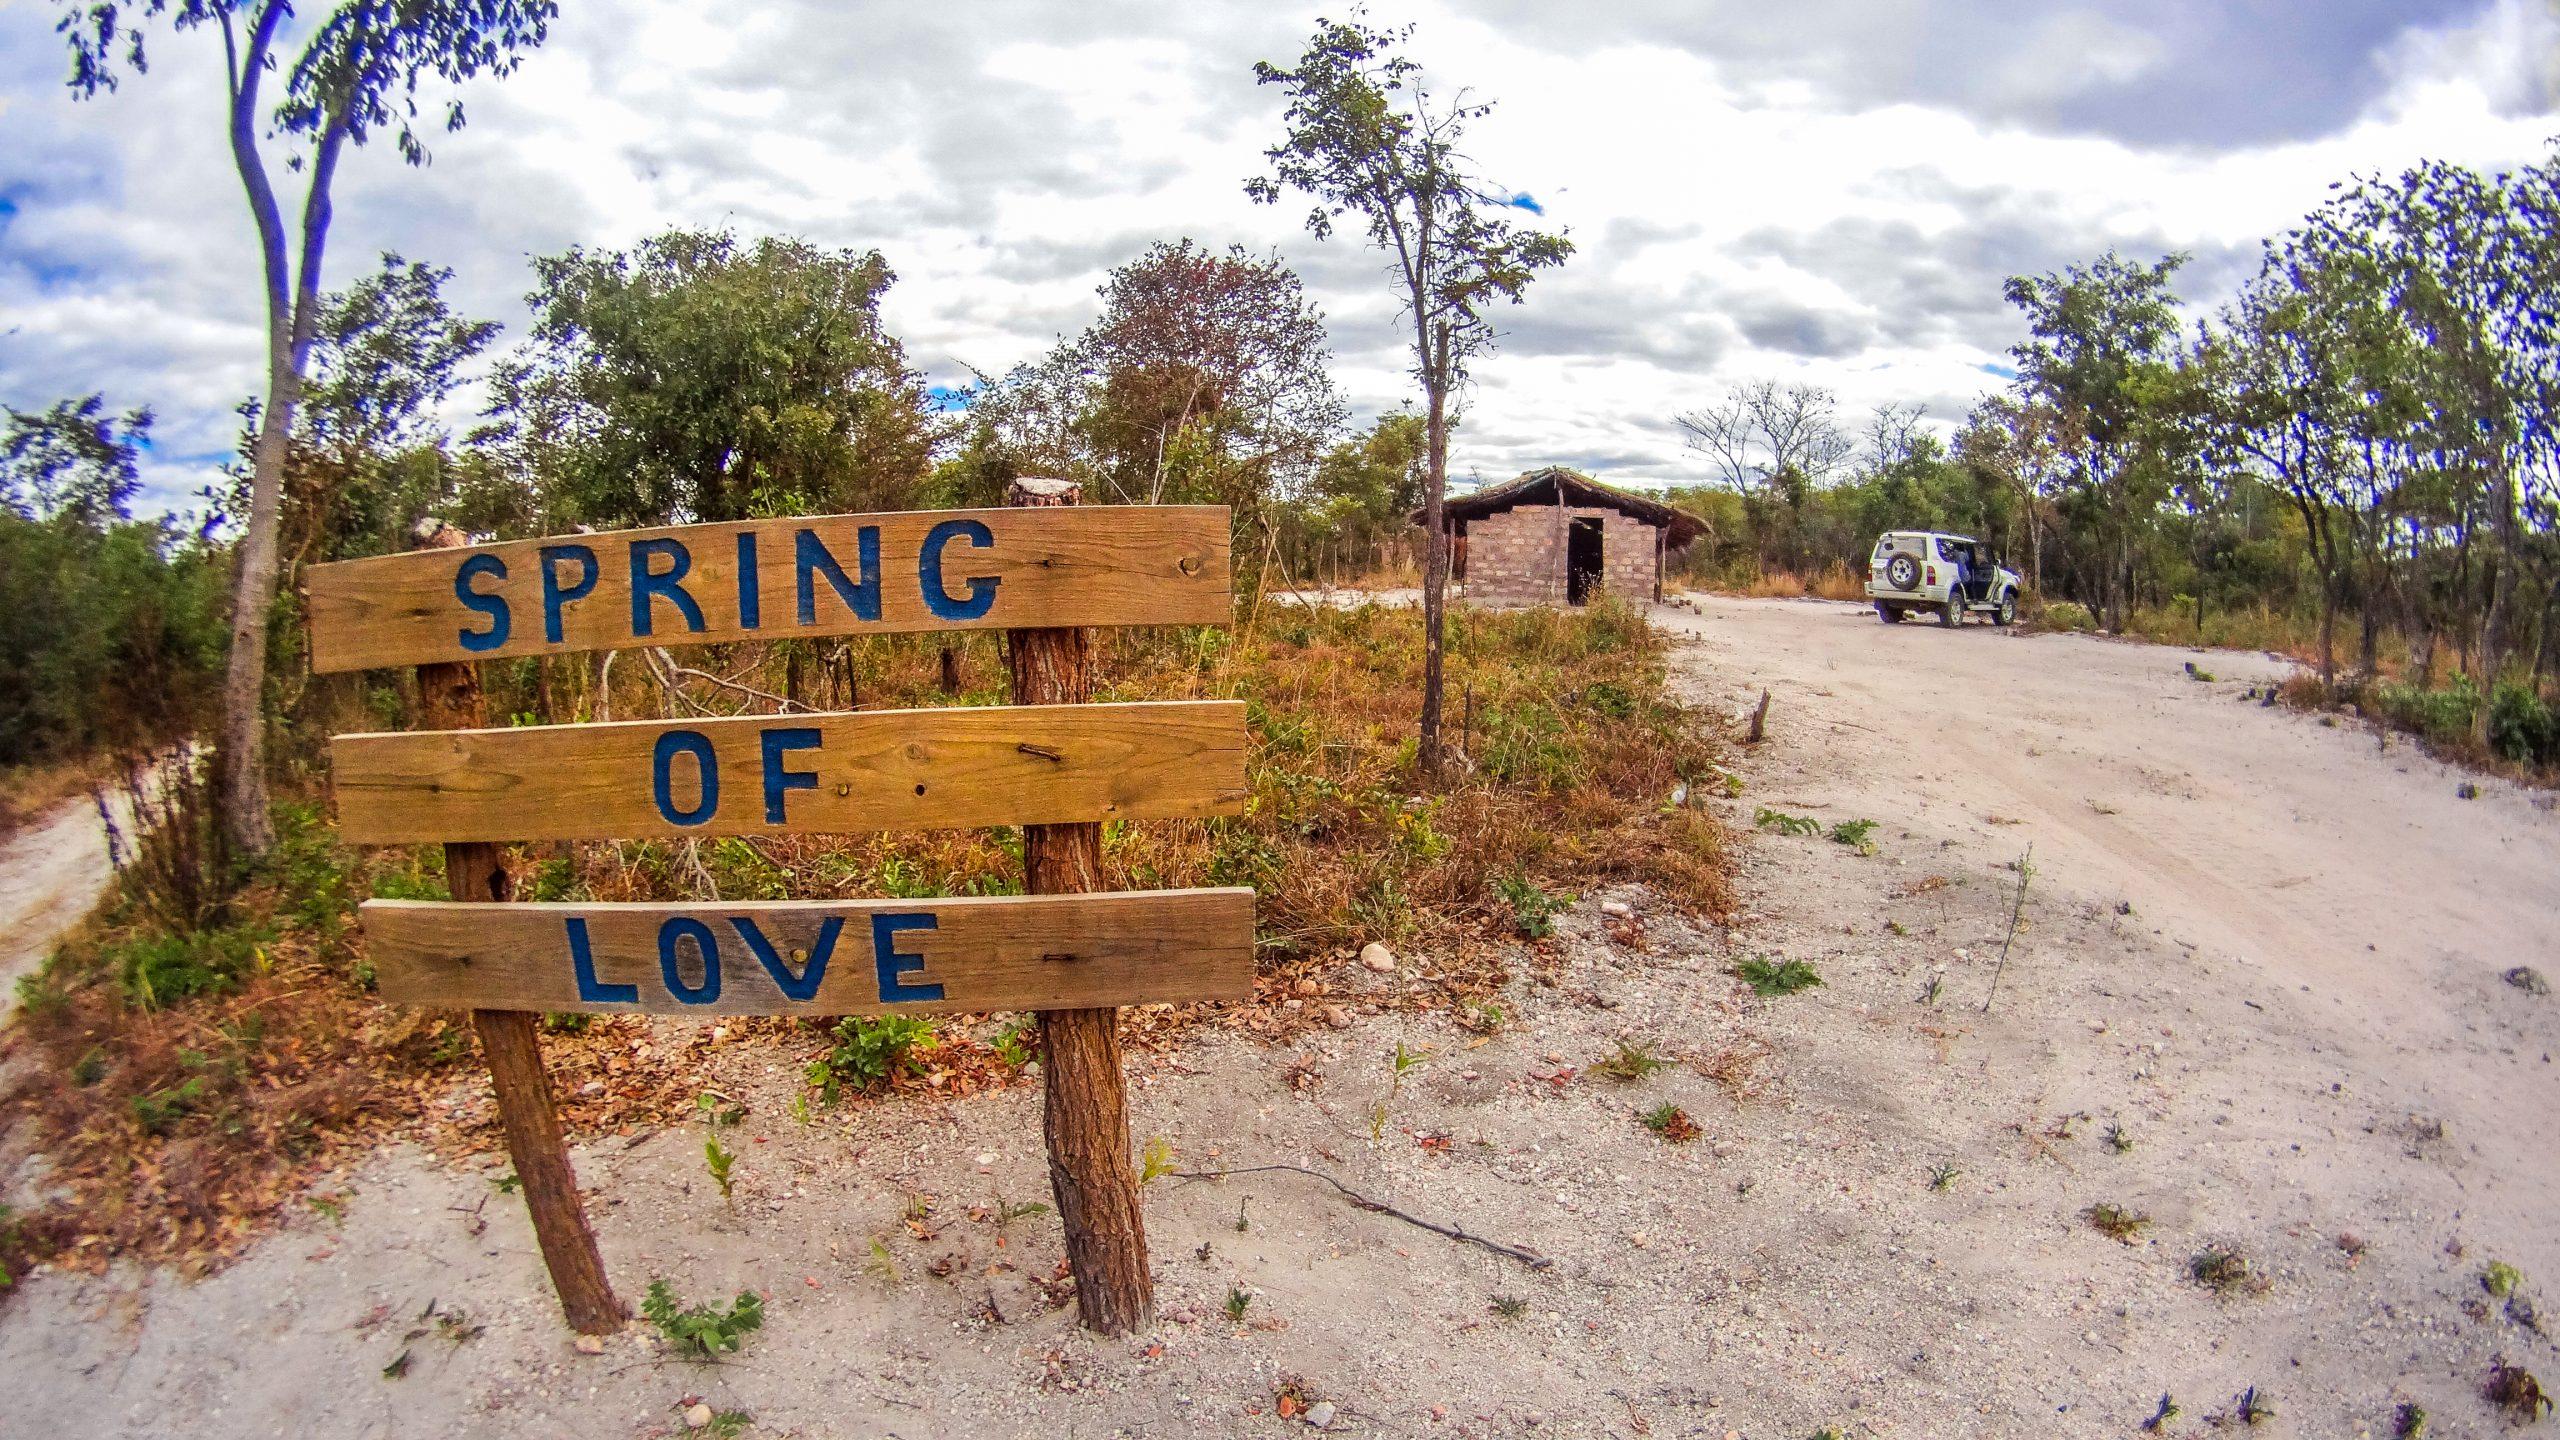 Spring of Love, Zambia